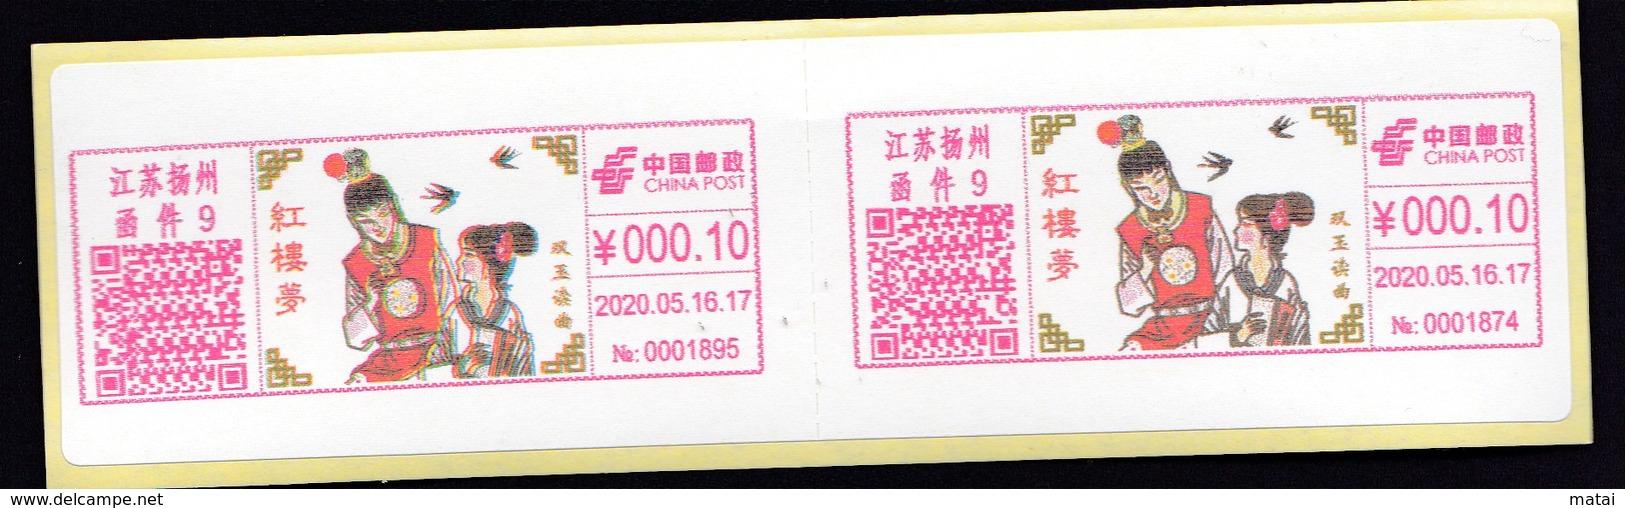 CHINA CHINE CINA  2020.5.16 JIANGSU  YANGZHOU 函件 9 红楼梦 The Dream Of Red Mansion QR CODE METER  STAMP LEFT VARIETY RARE! - Unused Stamps